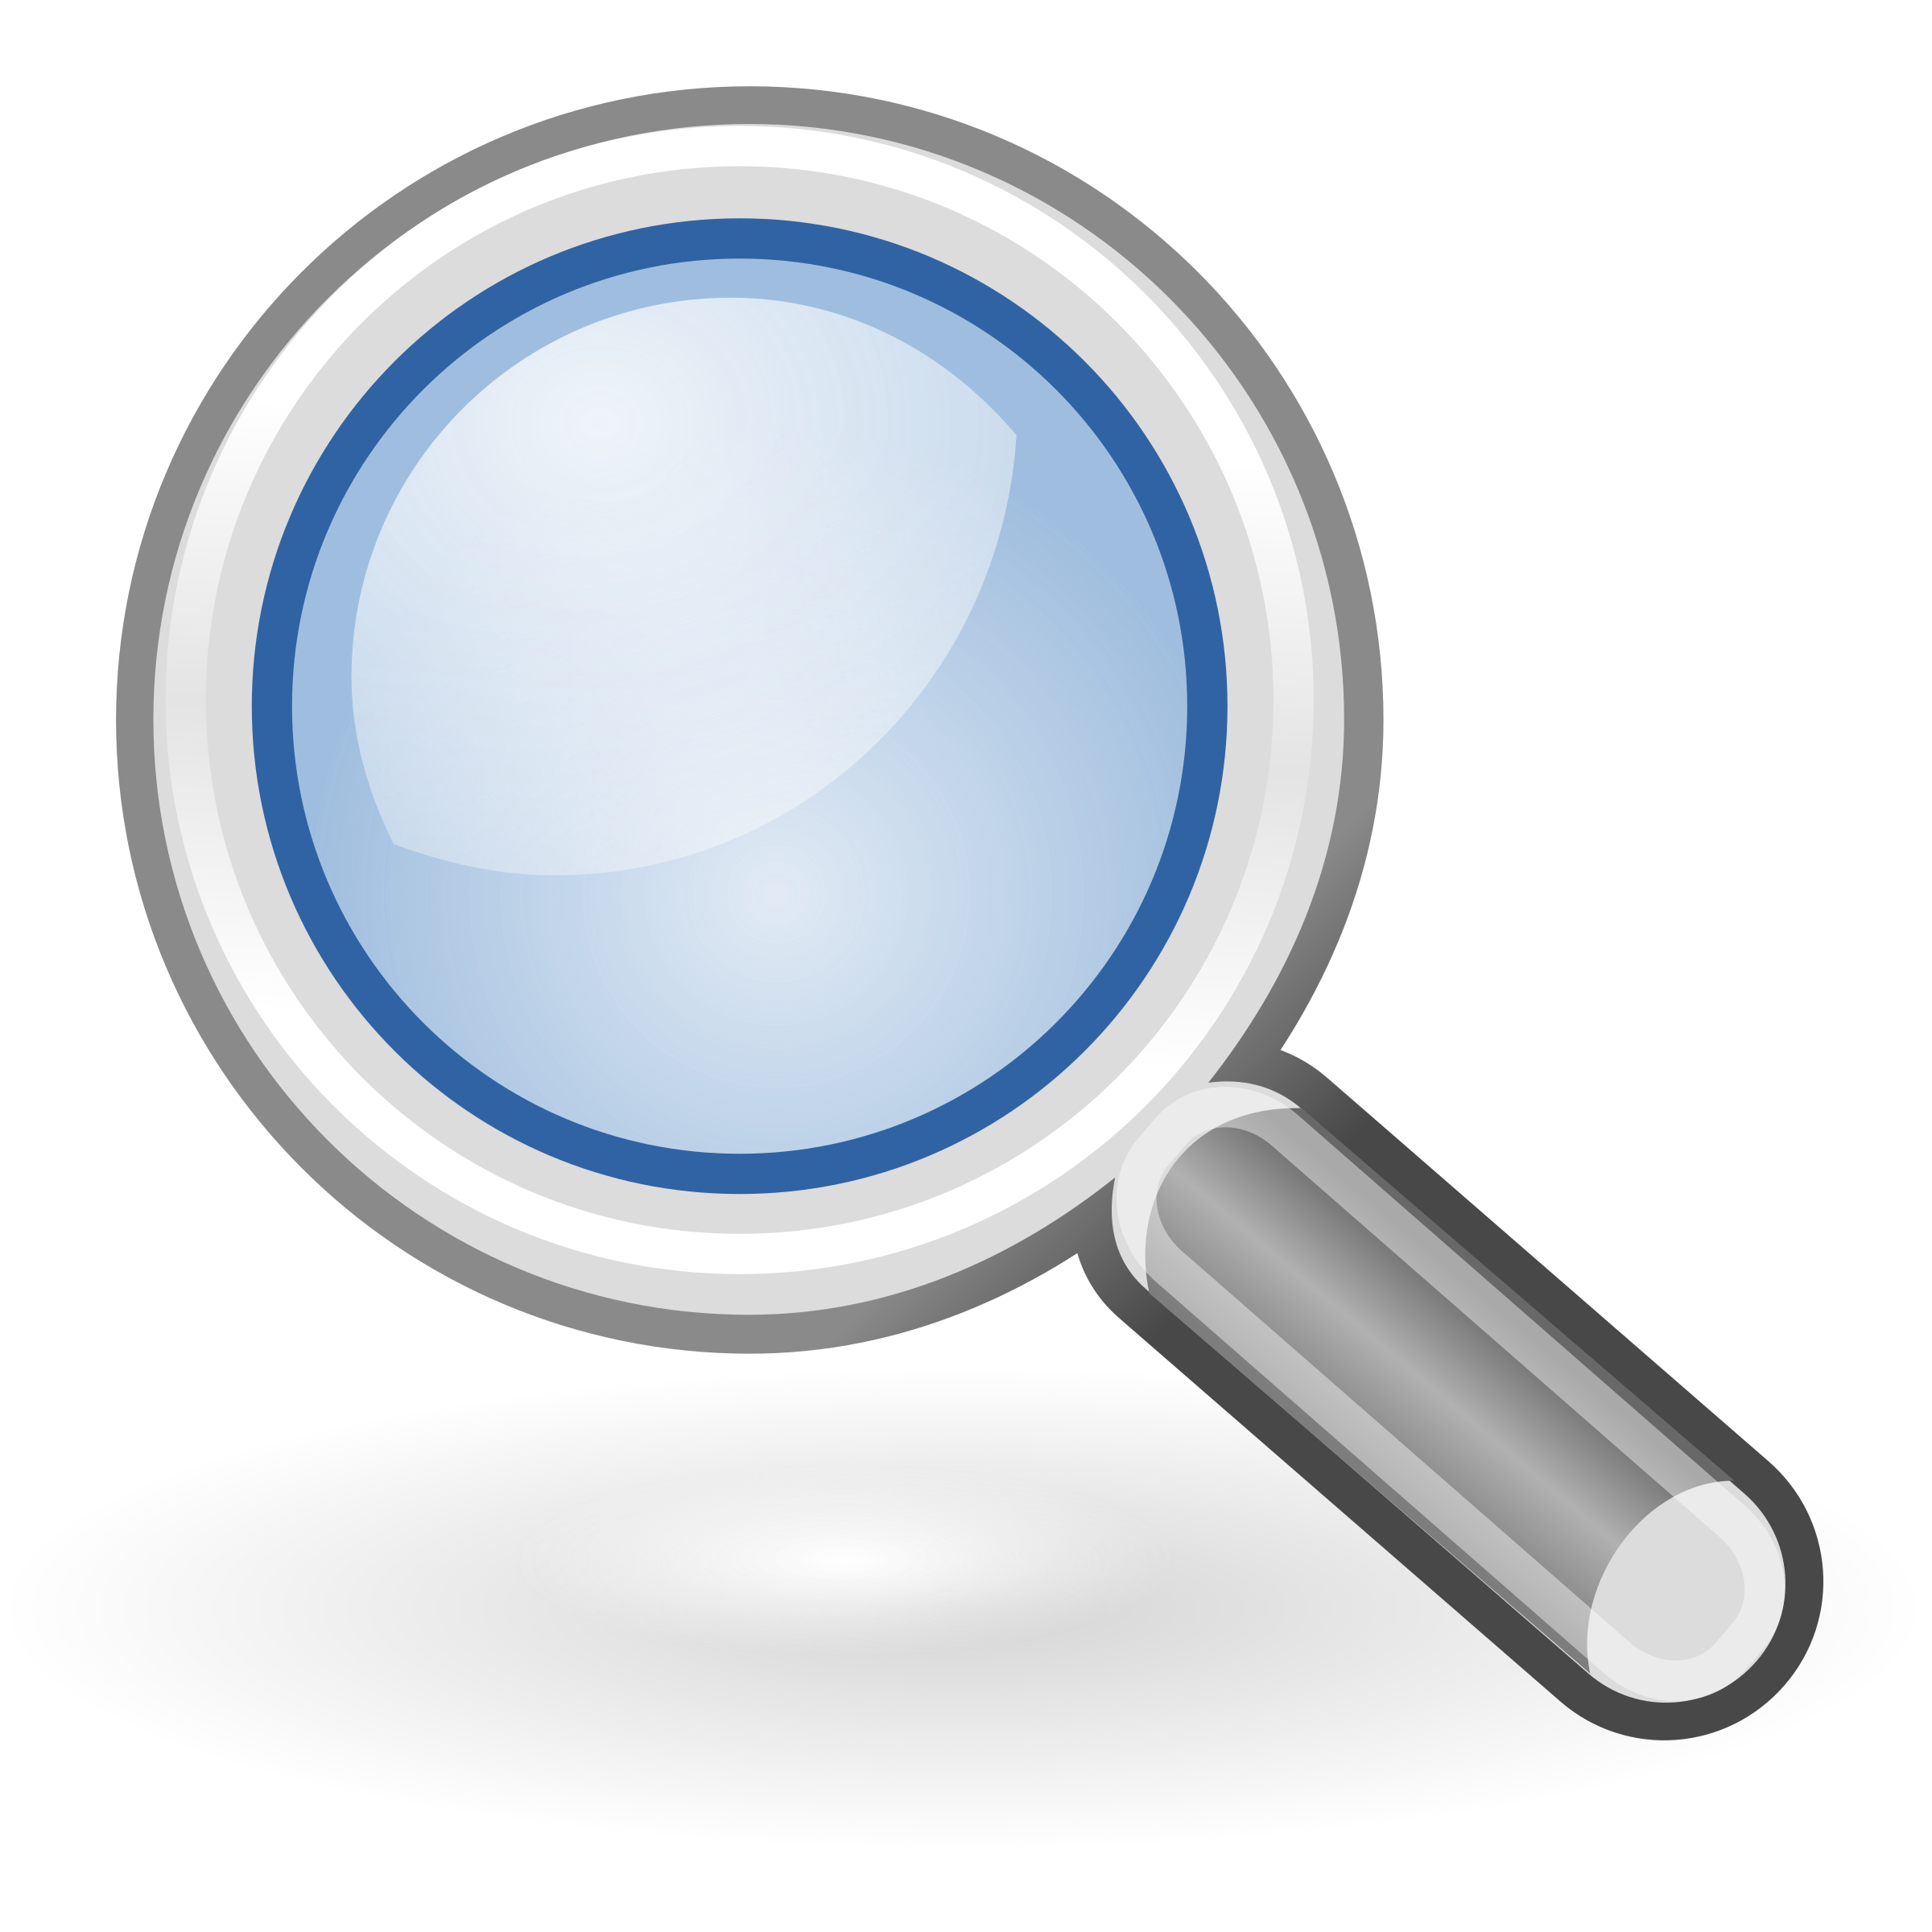 Search Clipart.